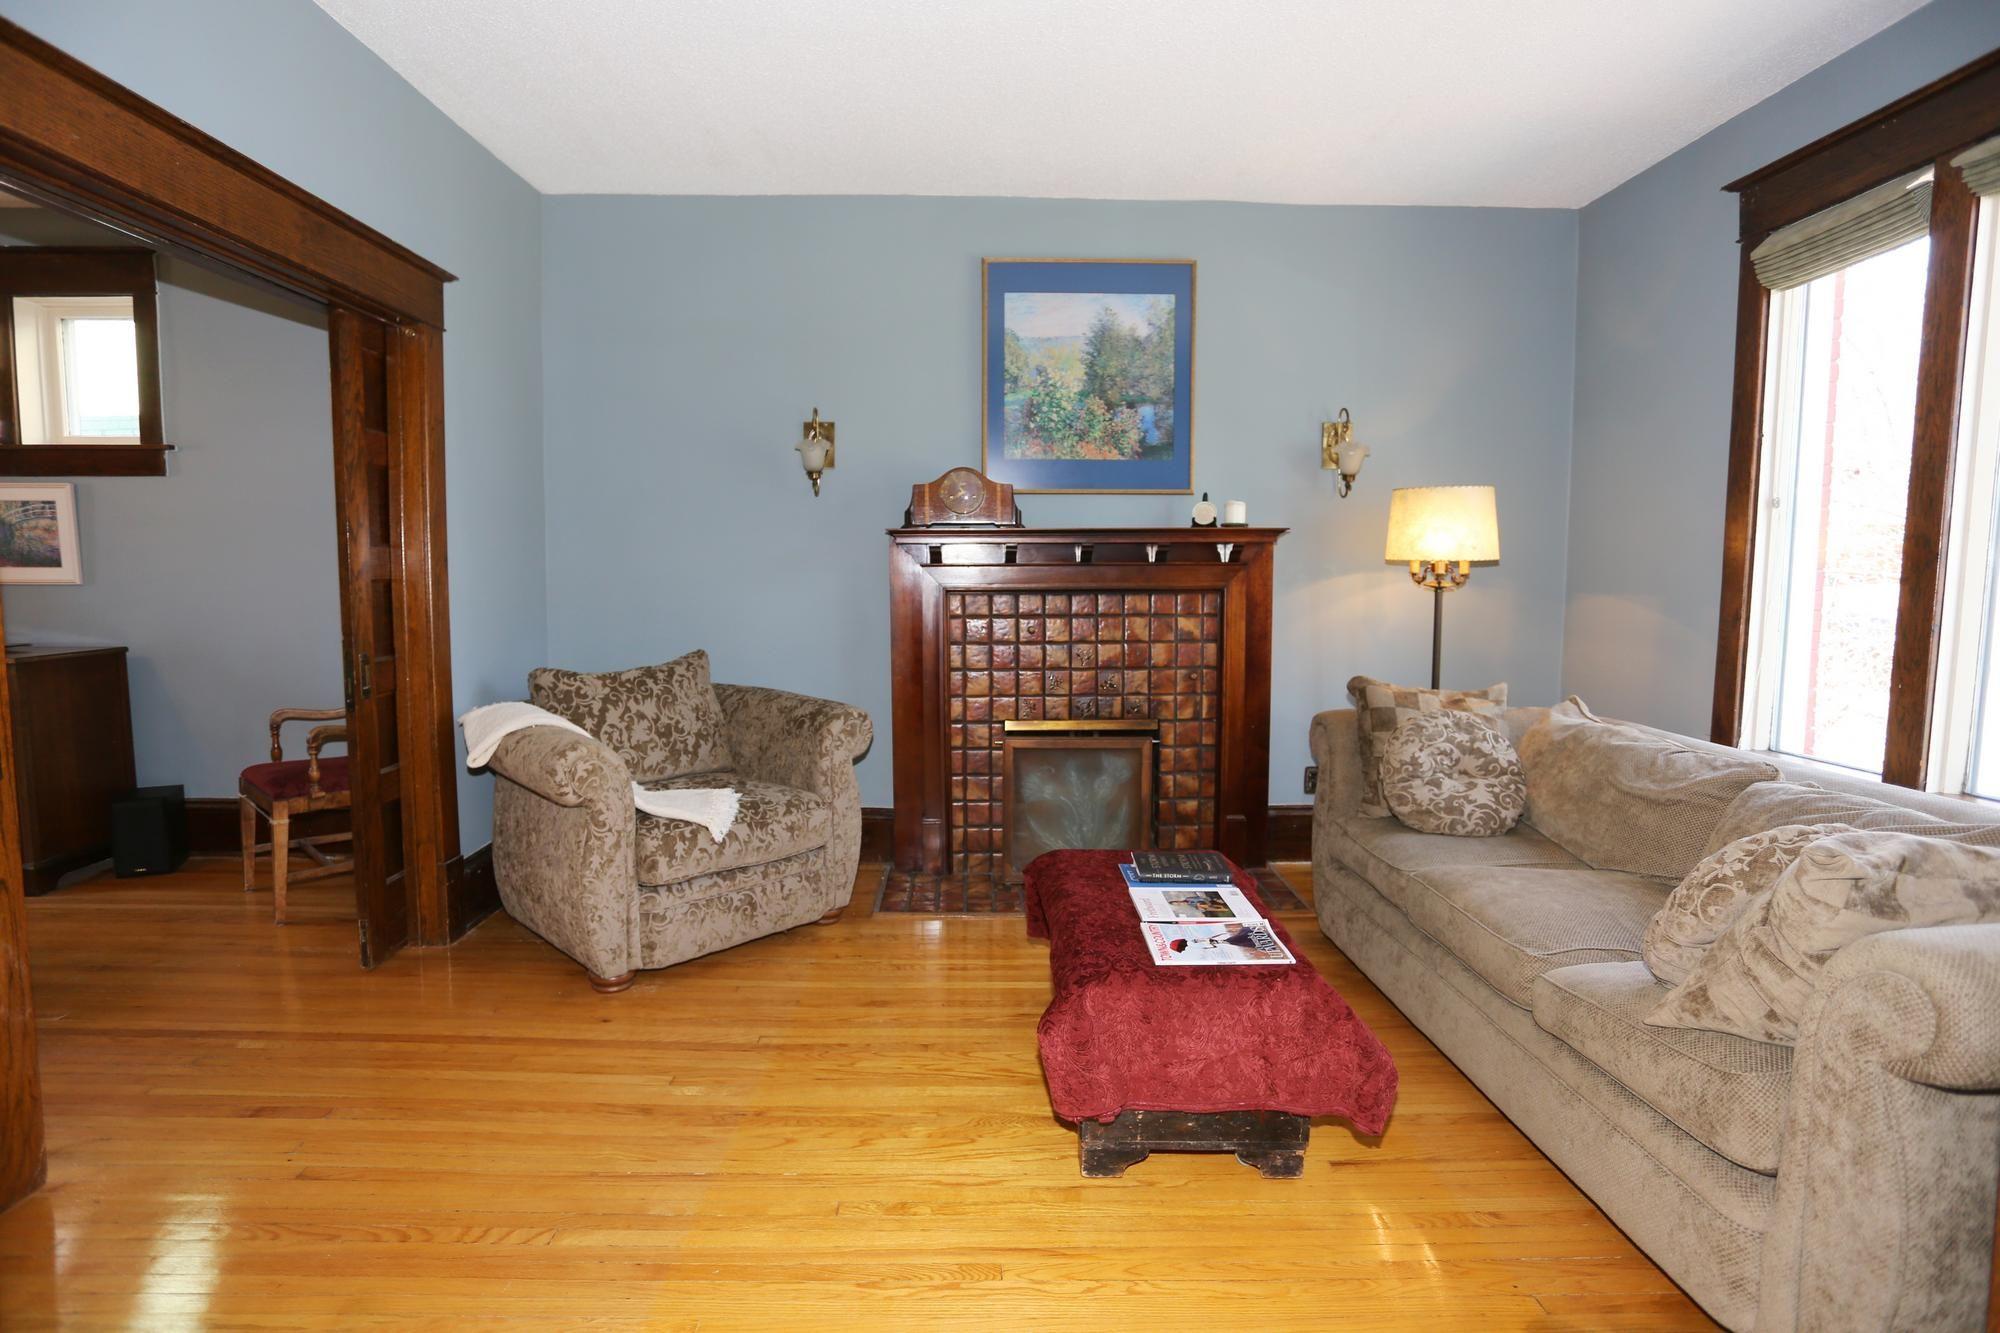 Photo 6: Photos: 96 Home Street in Winnipeg: Wolseley Single Family Detached for sale (5B)  : MLS®# 1810985